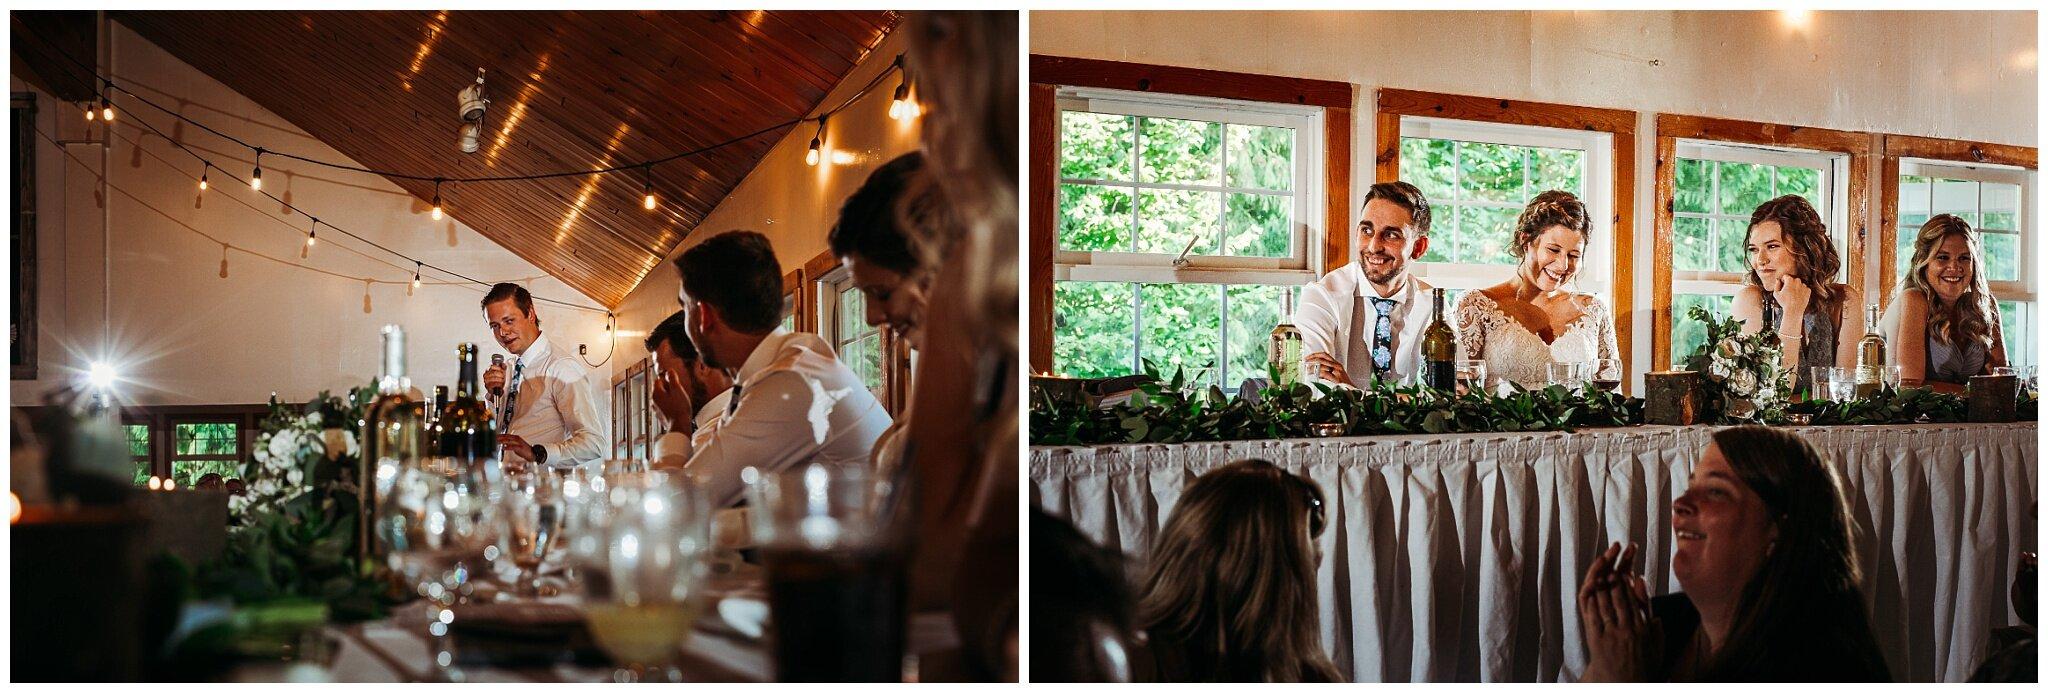 Eighteen Pastures Mission  BC Abbotsford BC Christian Wedding Photographer Summer Bride Groom Inspo_0043.jpg